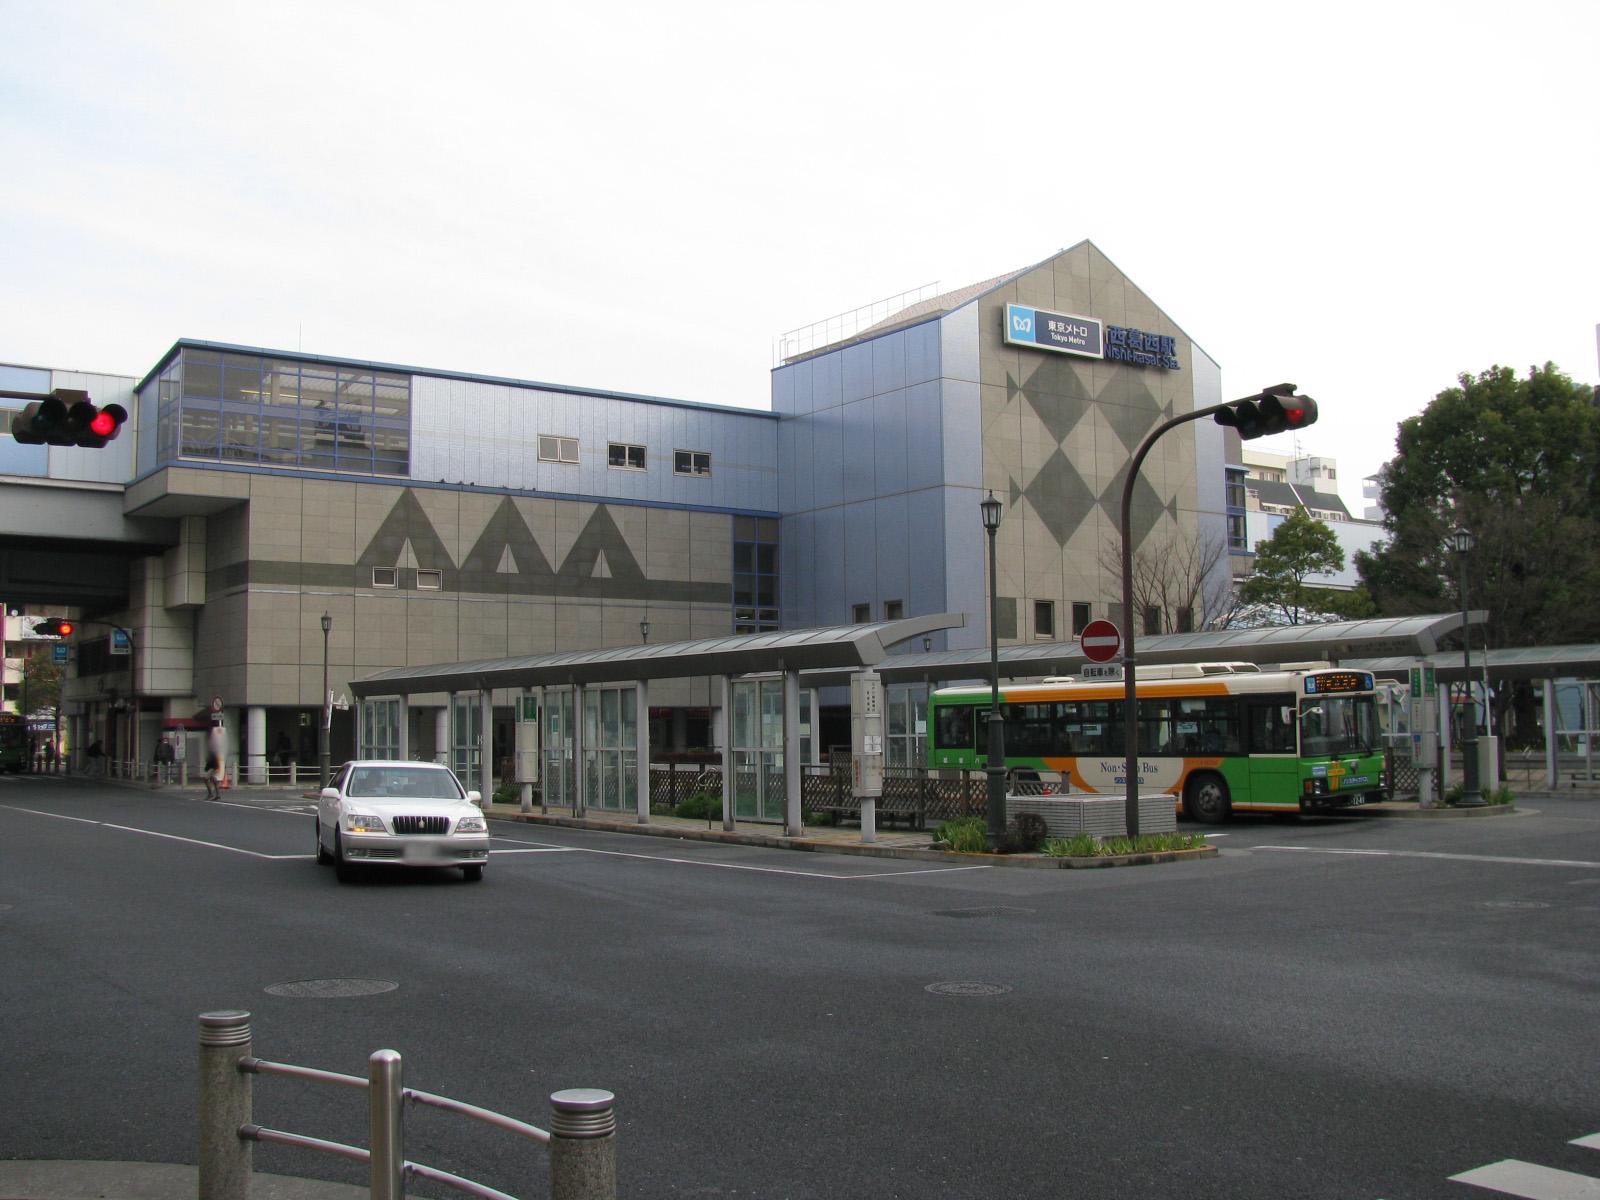 https://upload.wikimedia.org/wikipedia/commons/8/8a/Tokyo_Metro_Nishi-kasai_sta_002.jpg